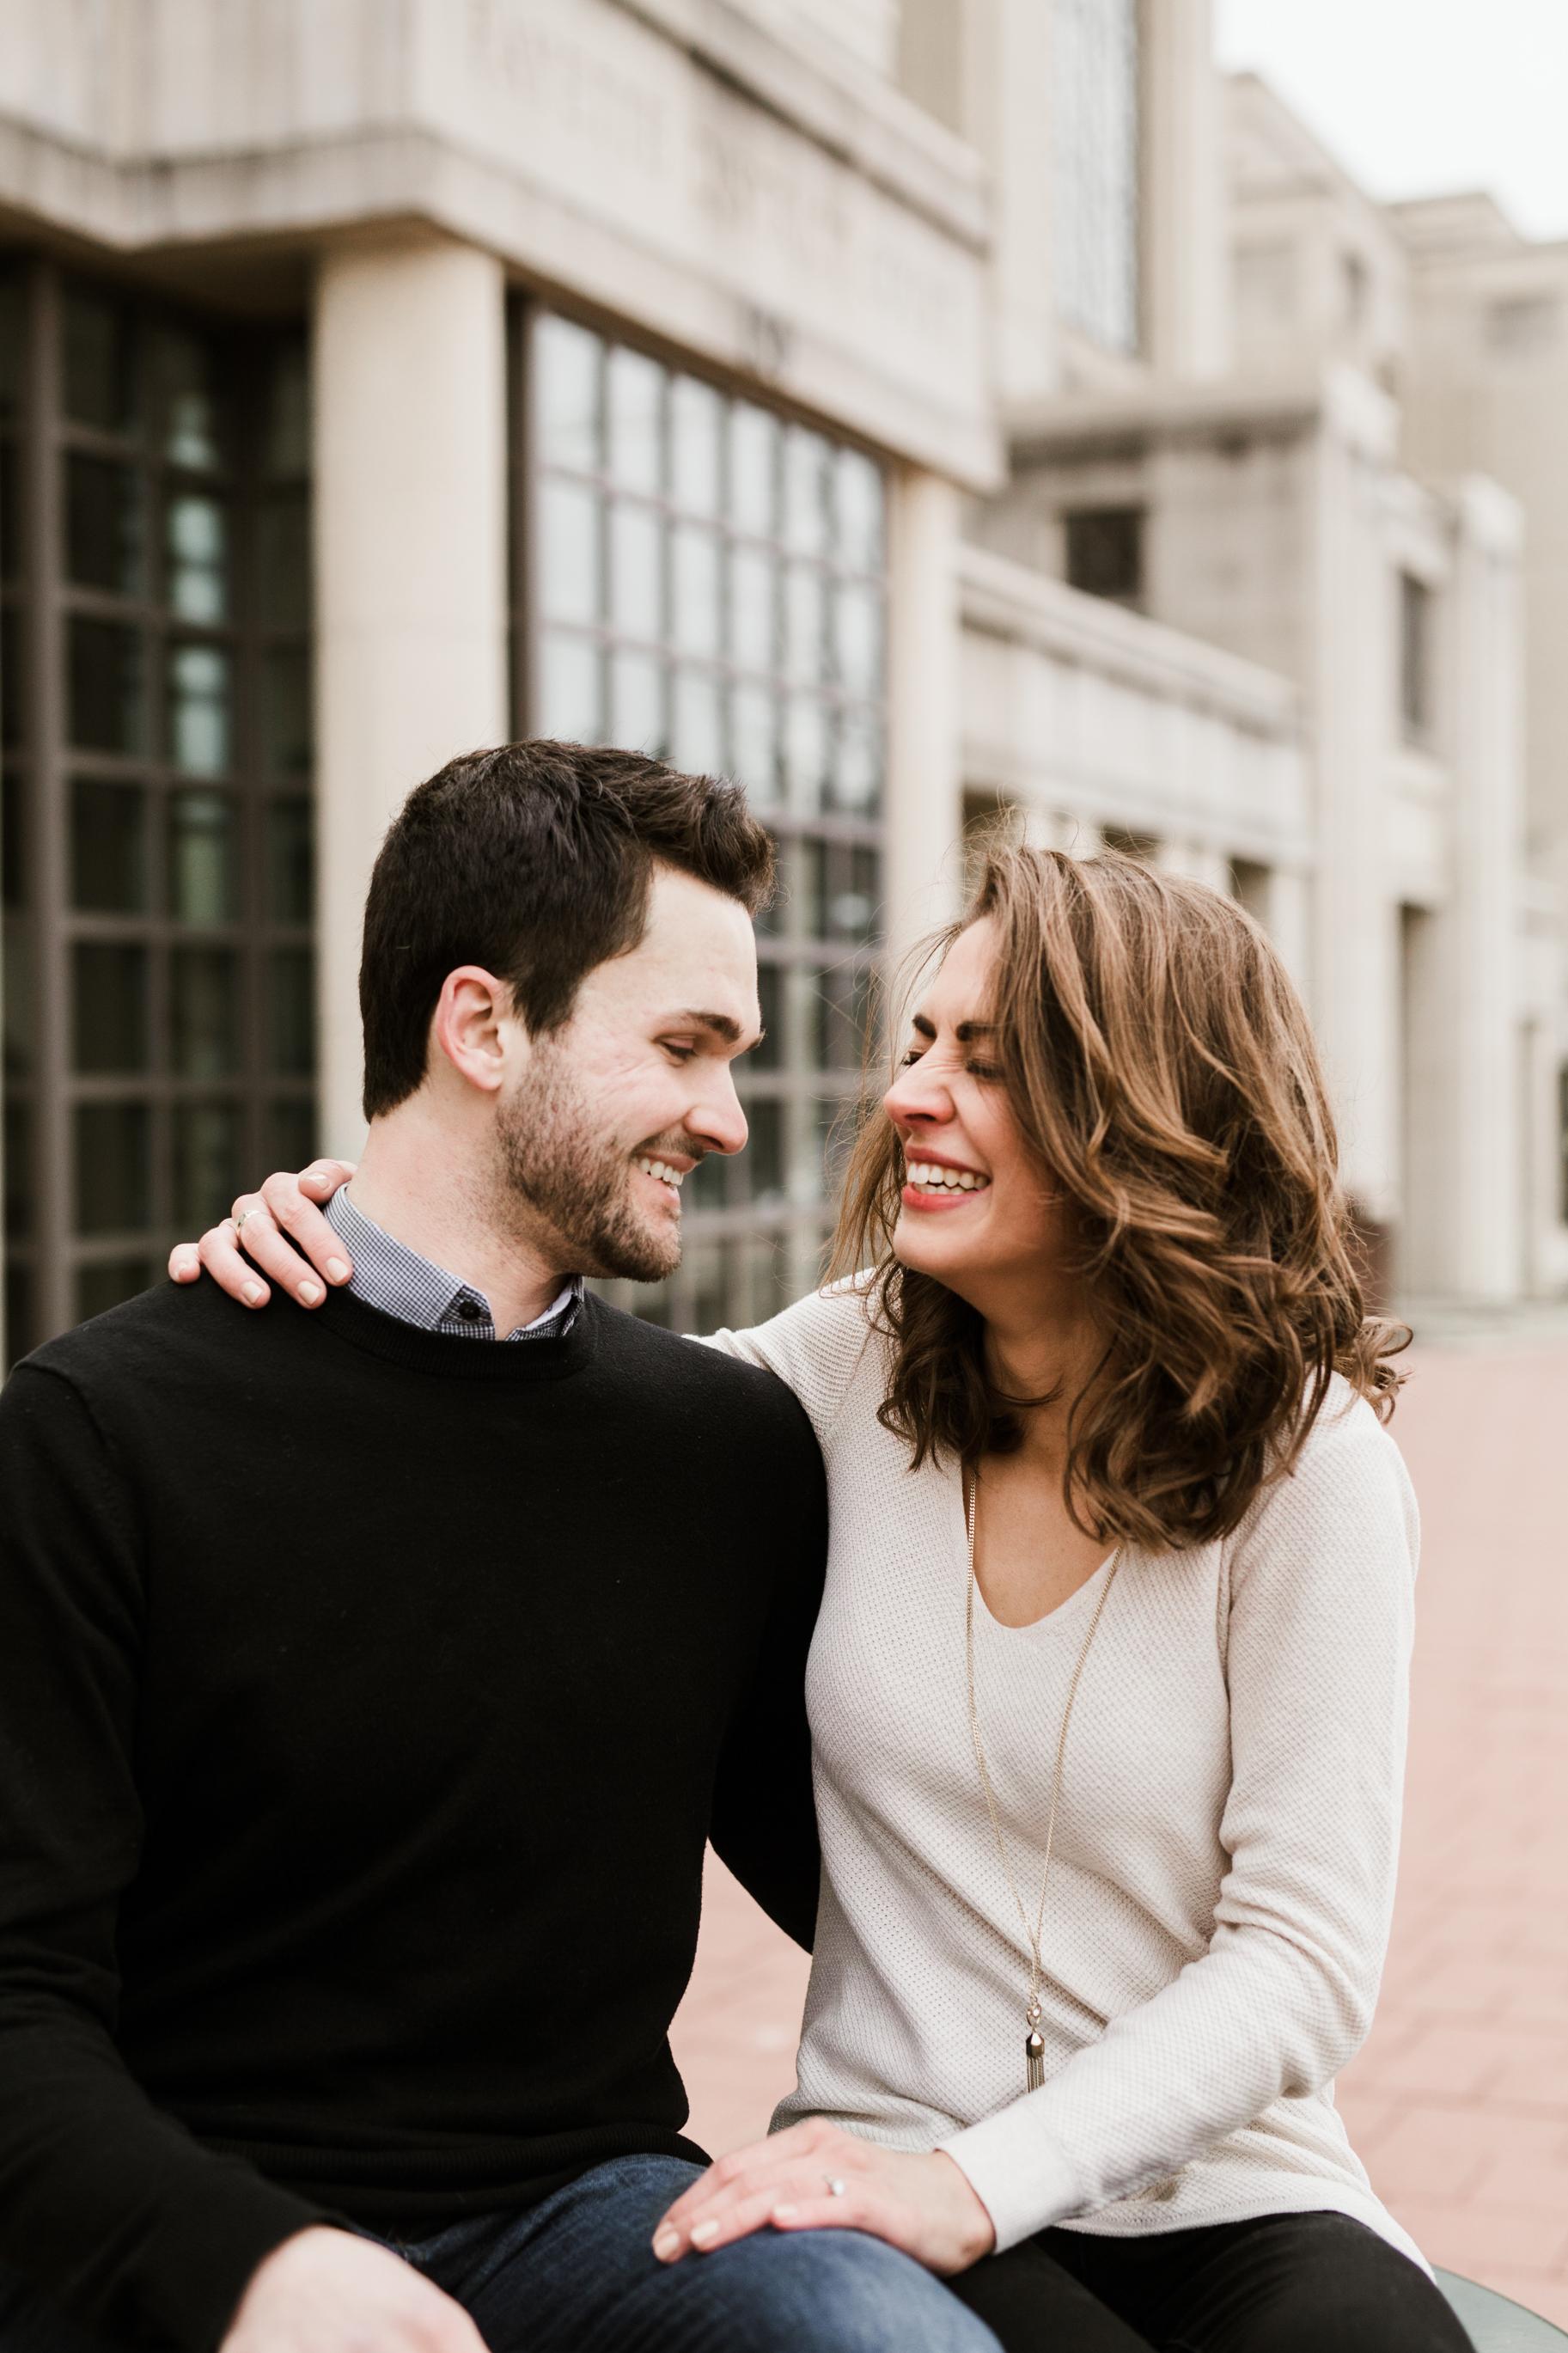 Ellen & Lee Engagement 2018 WEBSITE SP Crystal Ludwick Photo (9 of 54).jpg